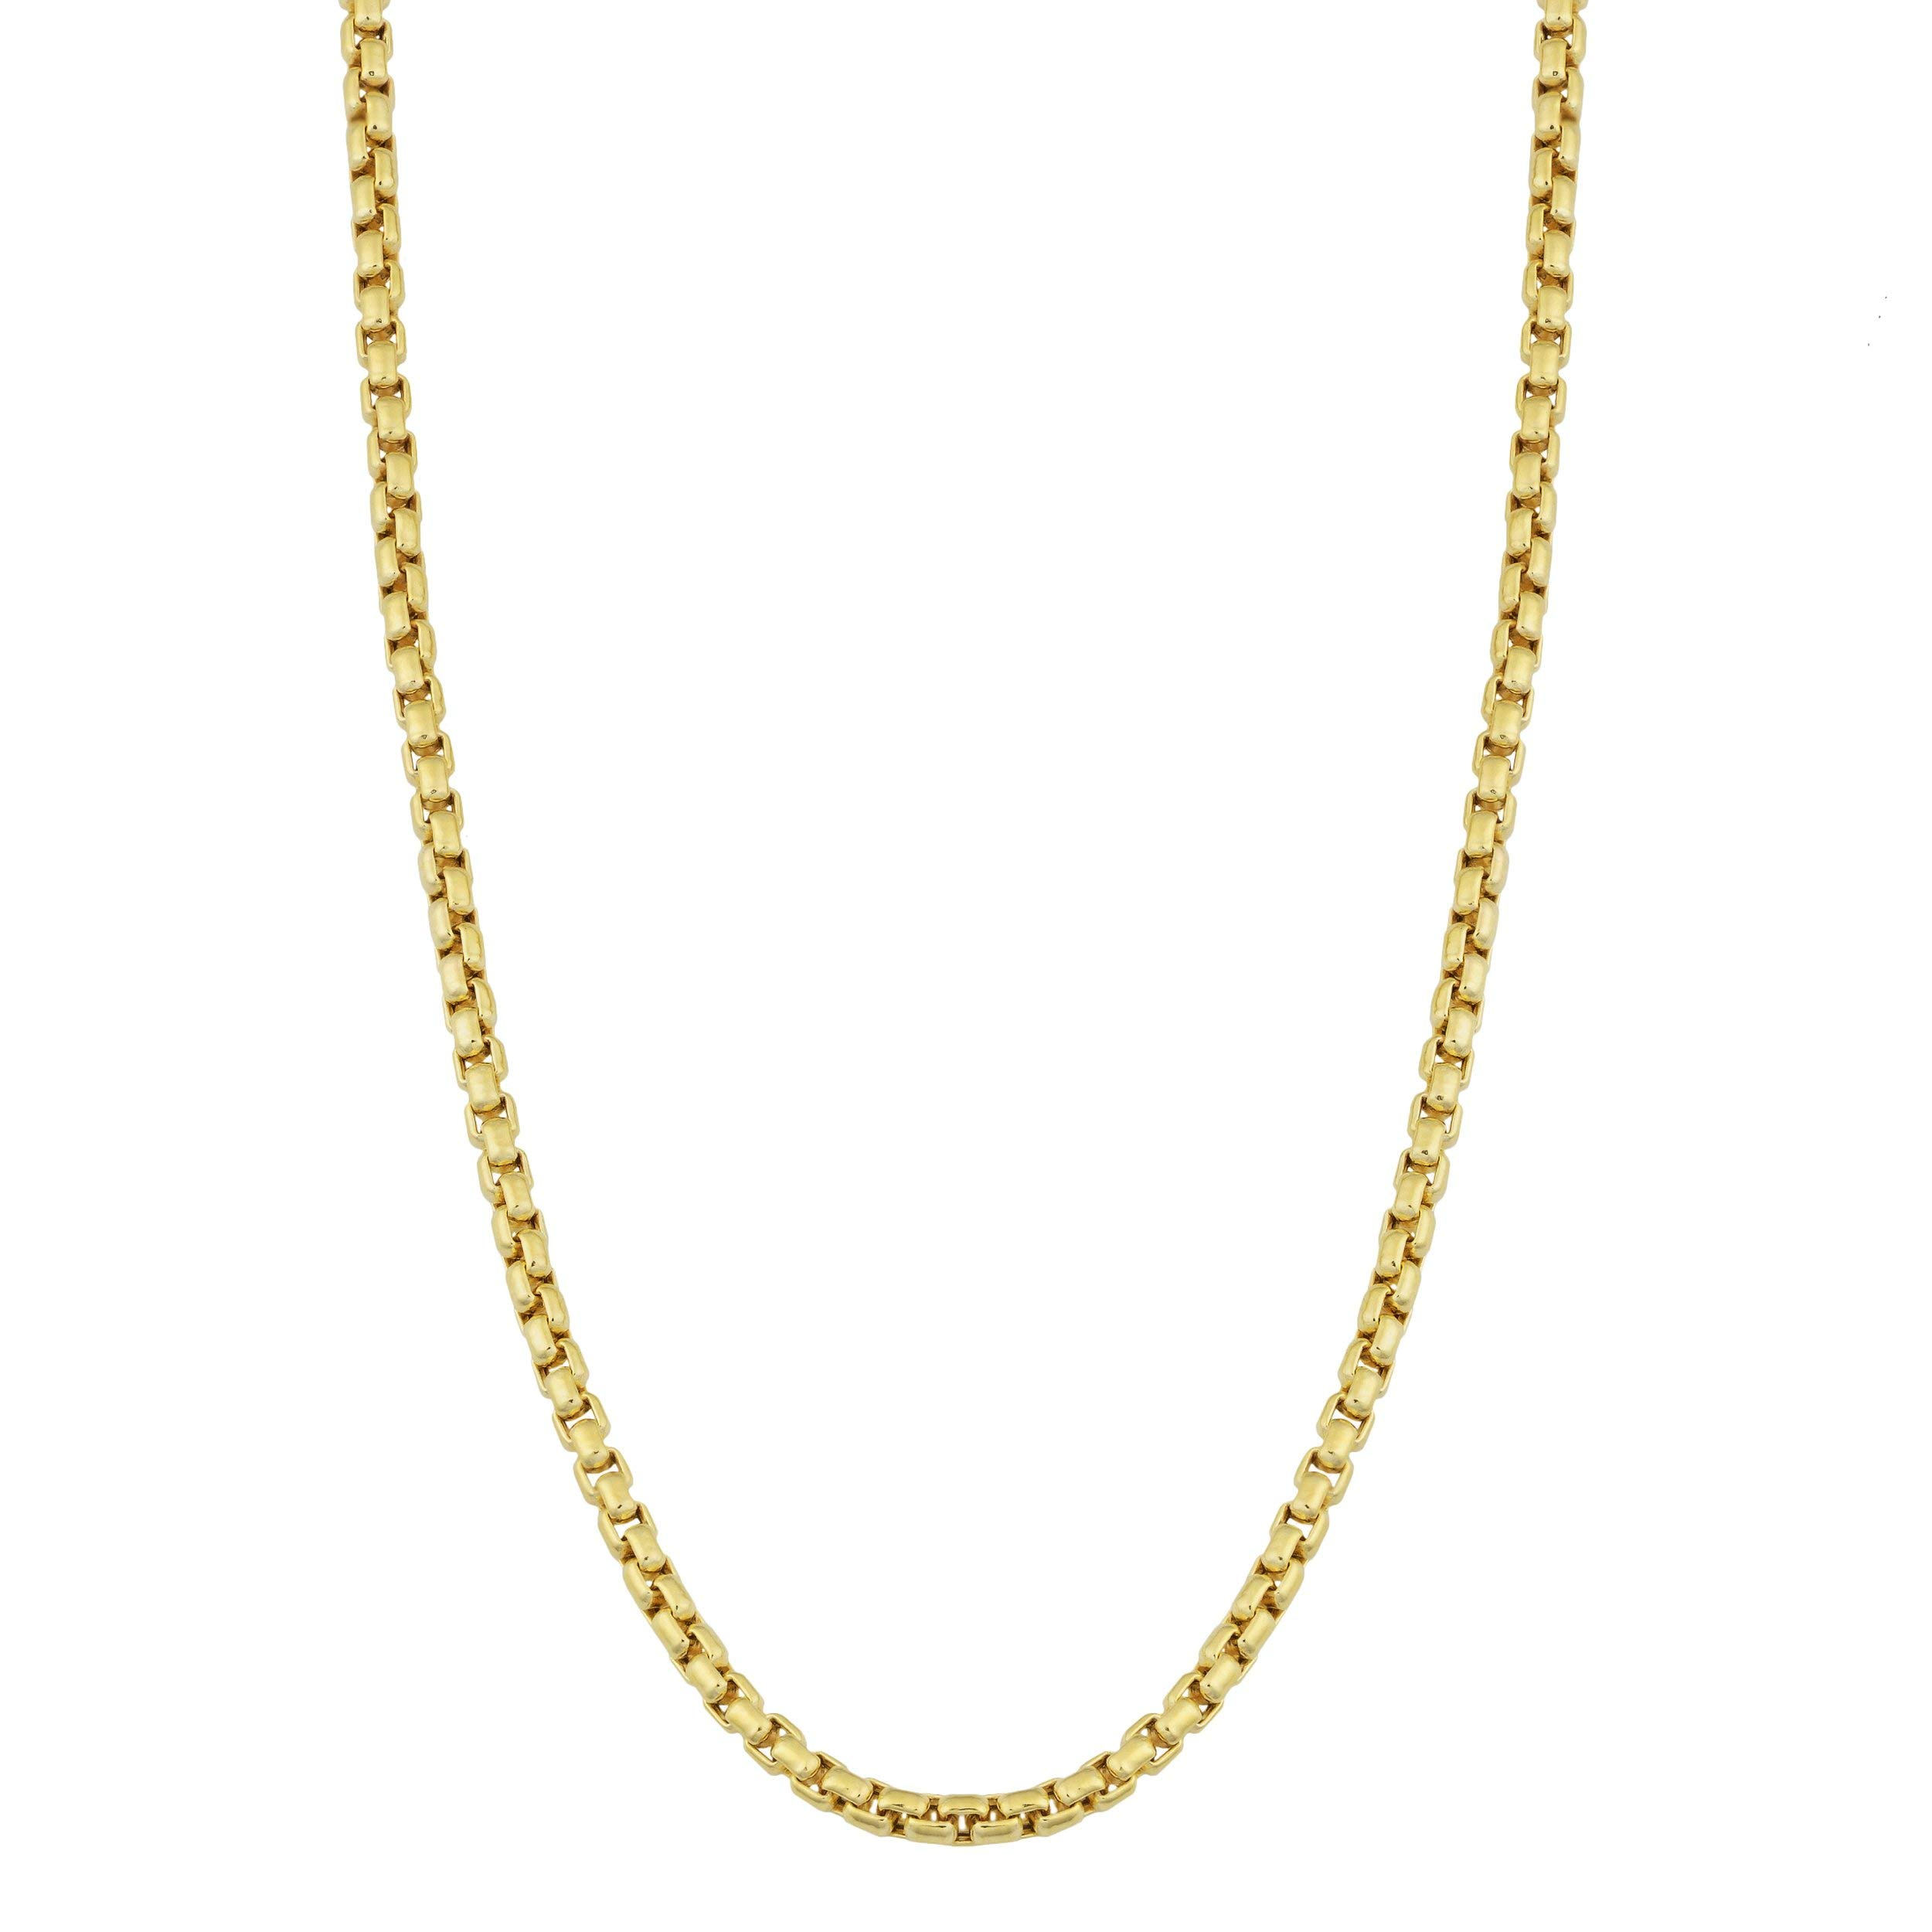 Verona Jewelers 10K Yellow Gold 2MM Round Box Chain Necklace, 10K Box Necklace, 10K Gold Necklace, 10K Gold Pendant Necklace 18-30 (30, 2MM)